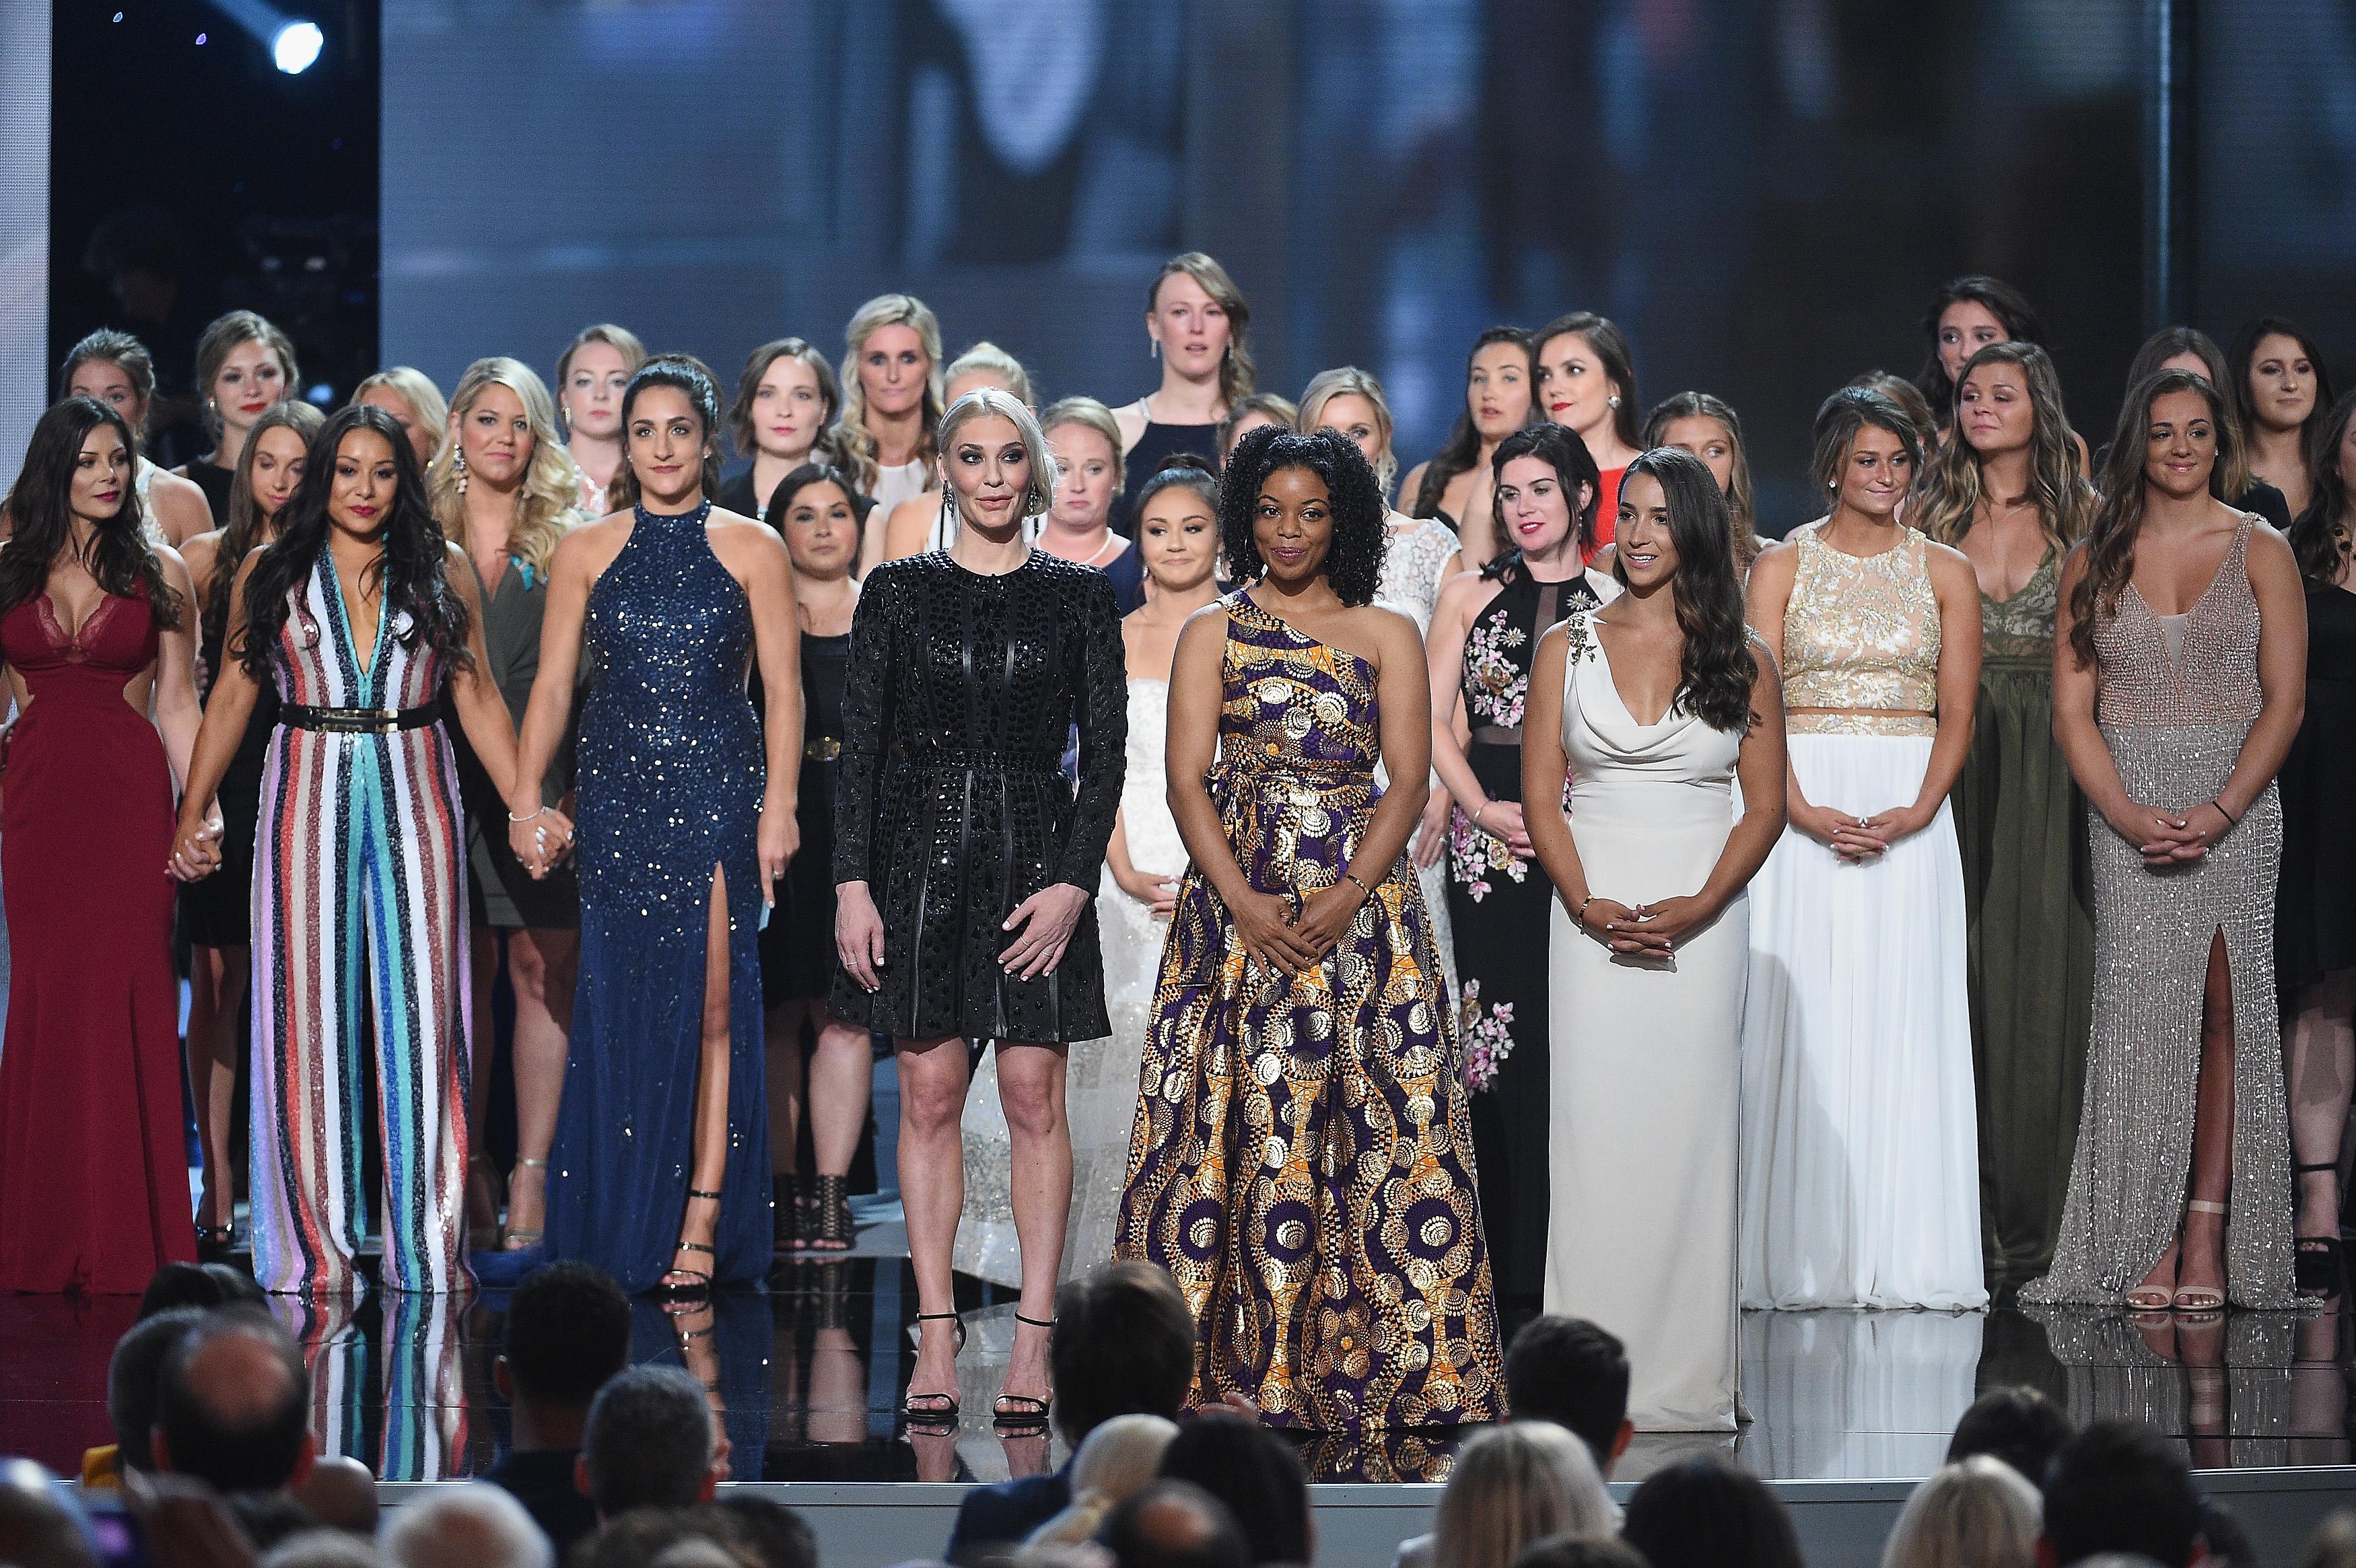 Aly-Raisman-Sarah-Klein-Tiffany-Thomas-Lopez-140-Victims-Of-Larry-Nassar-Bring-ESPY-Awards-To-Their-Feet-We-Survive-Together